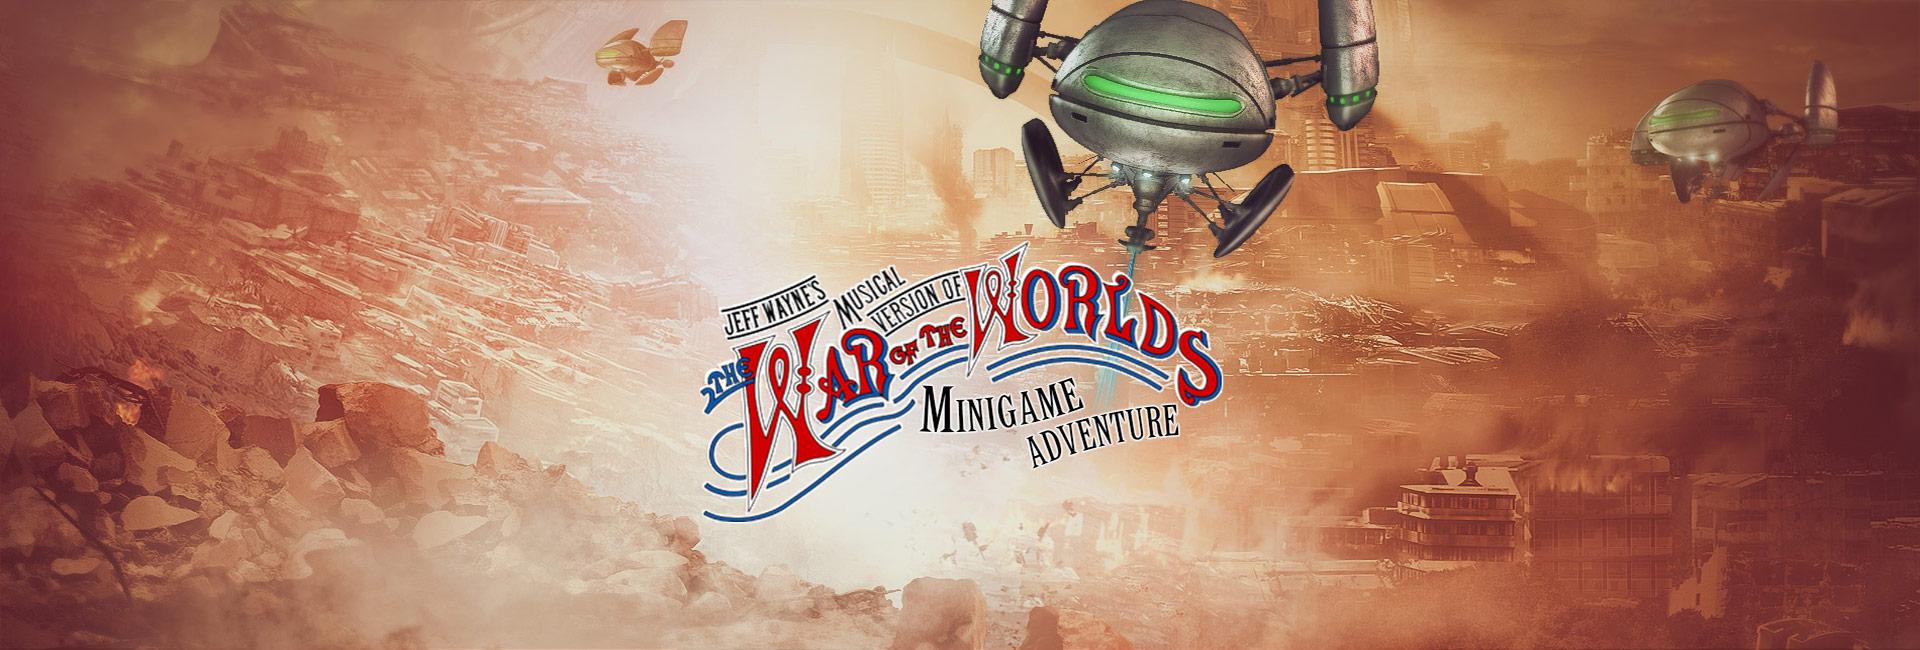 TWOTW: Minigame Adventure